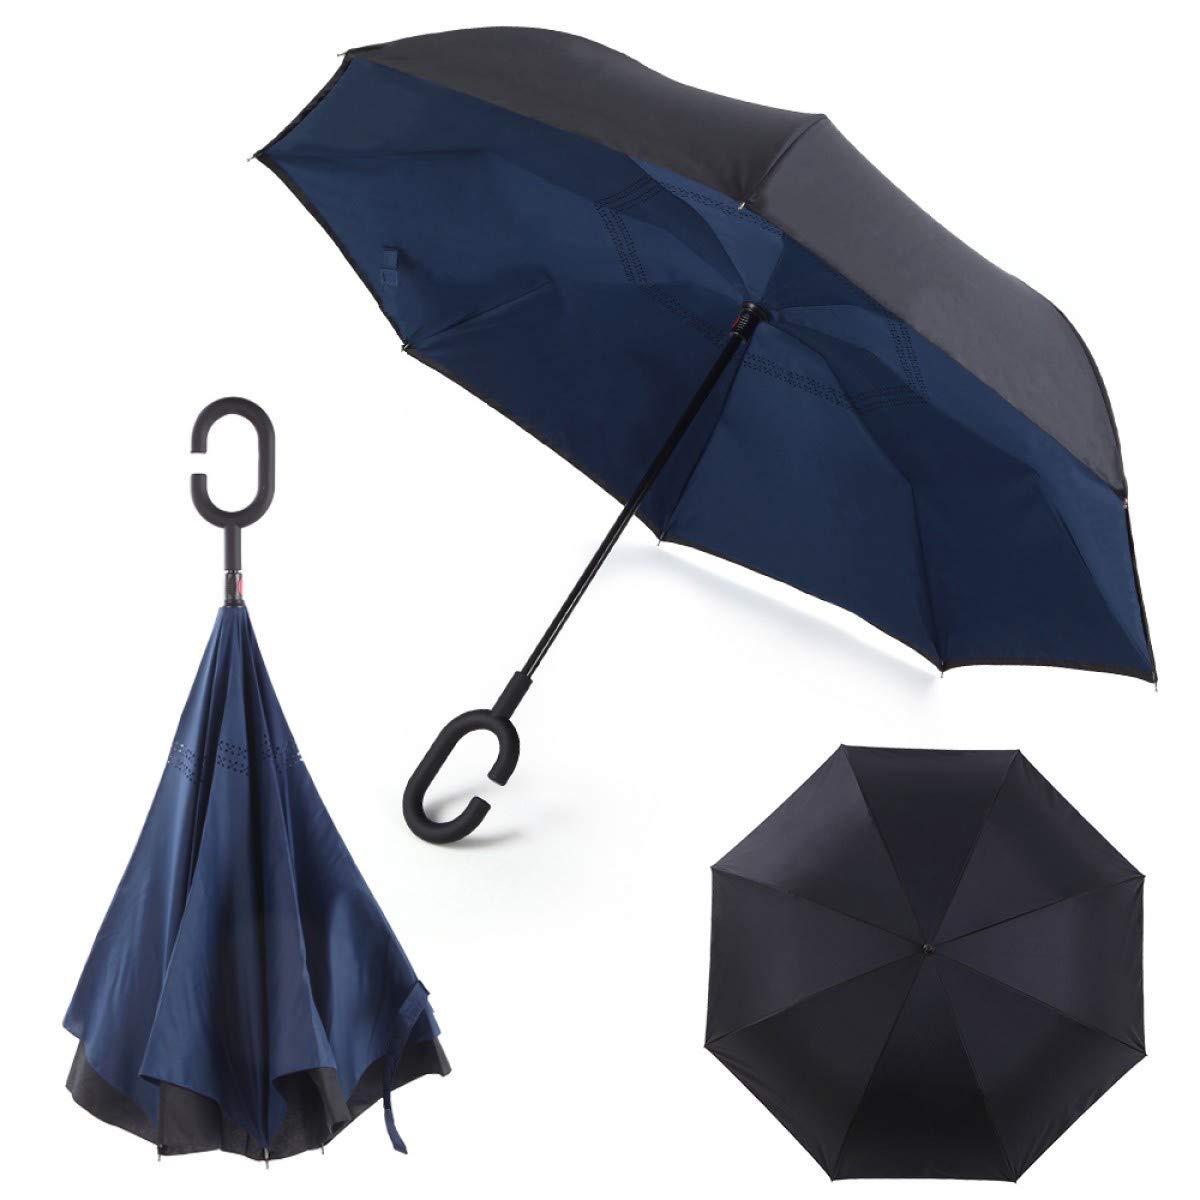 Paraguas invertido, inverso, Doble Capa aguanta de pie. Innovador se pliega al reves. Resistente, Mango Doble C, Funda. A Prueba de Viento. Azul Negro. Impermeable, Creativo para Coche. Regalo Ideal